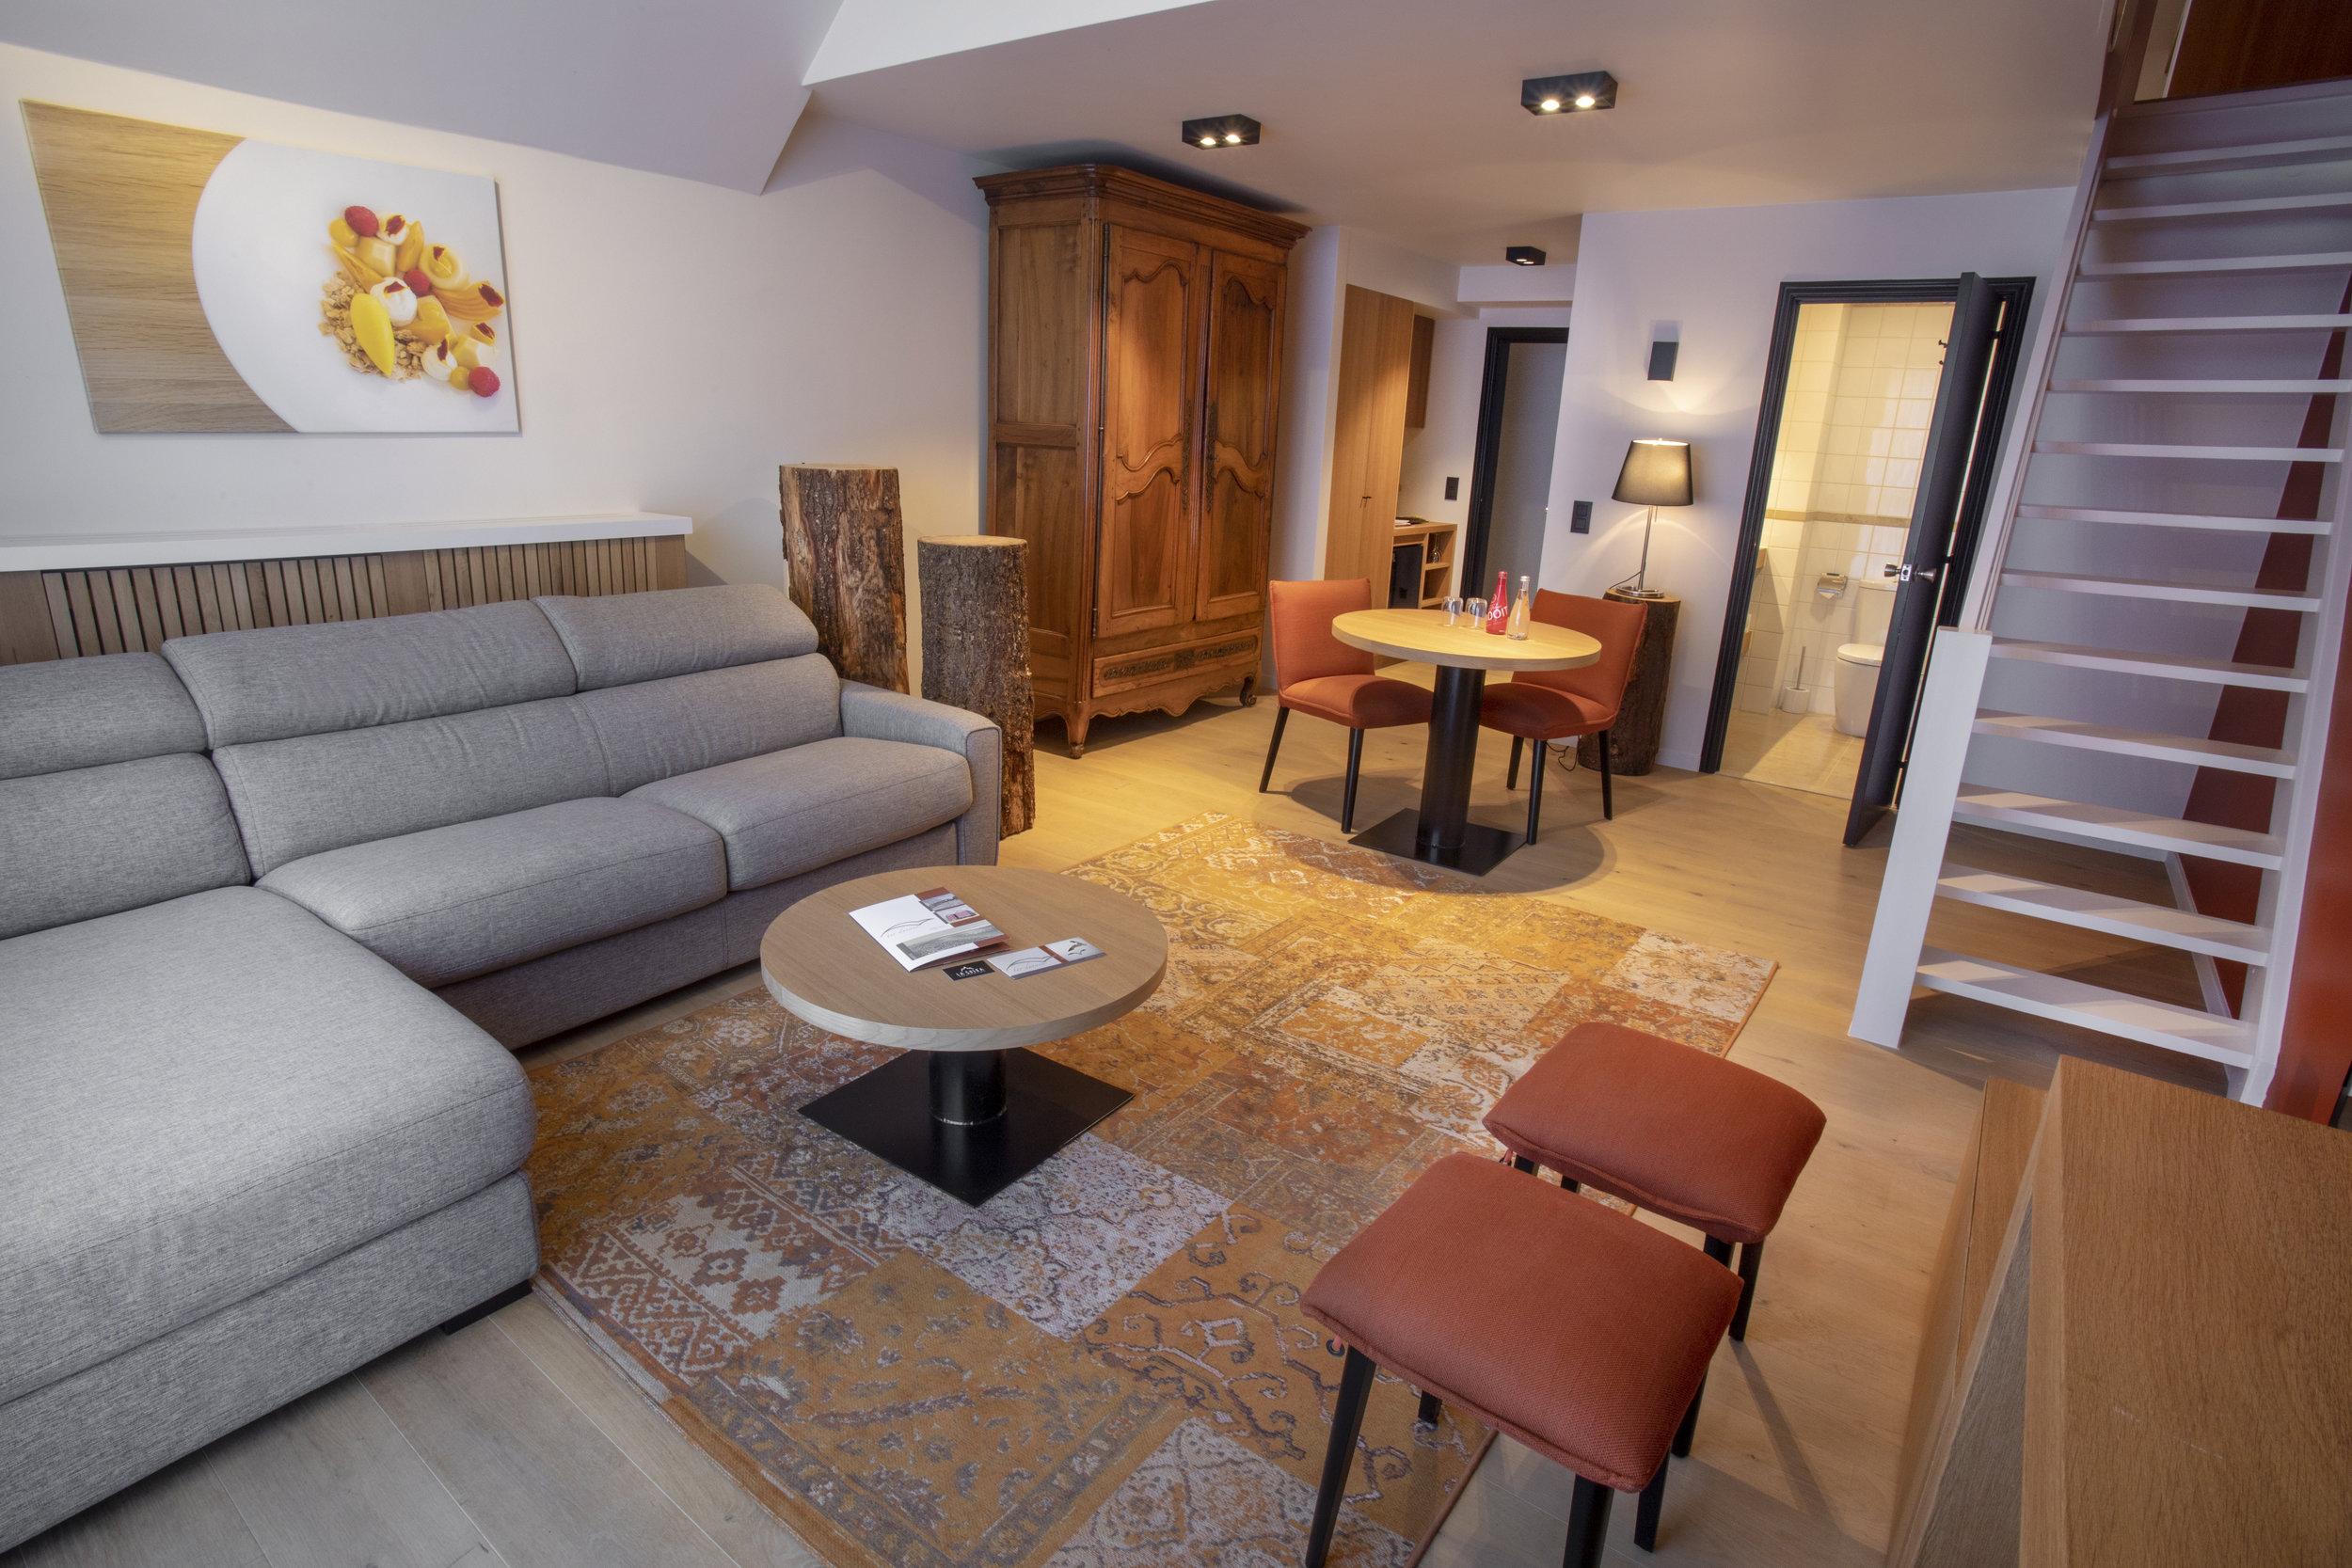 5 TER DUINEN HOTEL Jan D'Hondt © 2019.jpg